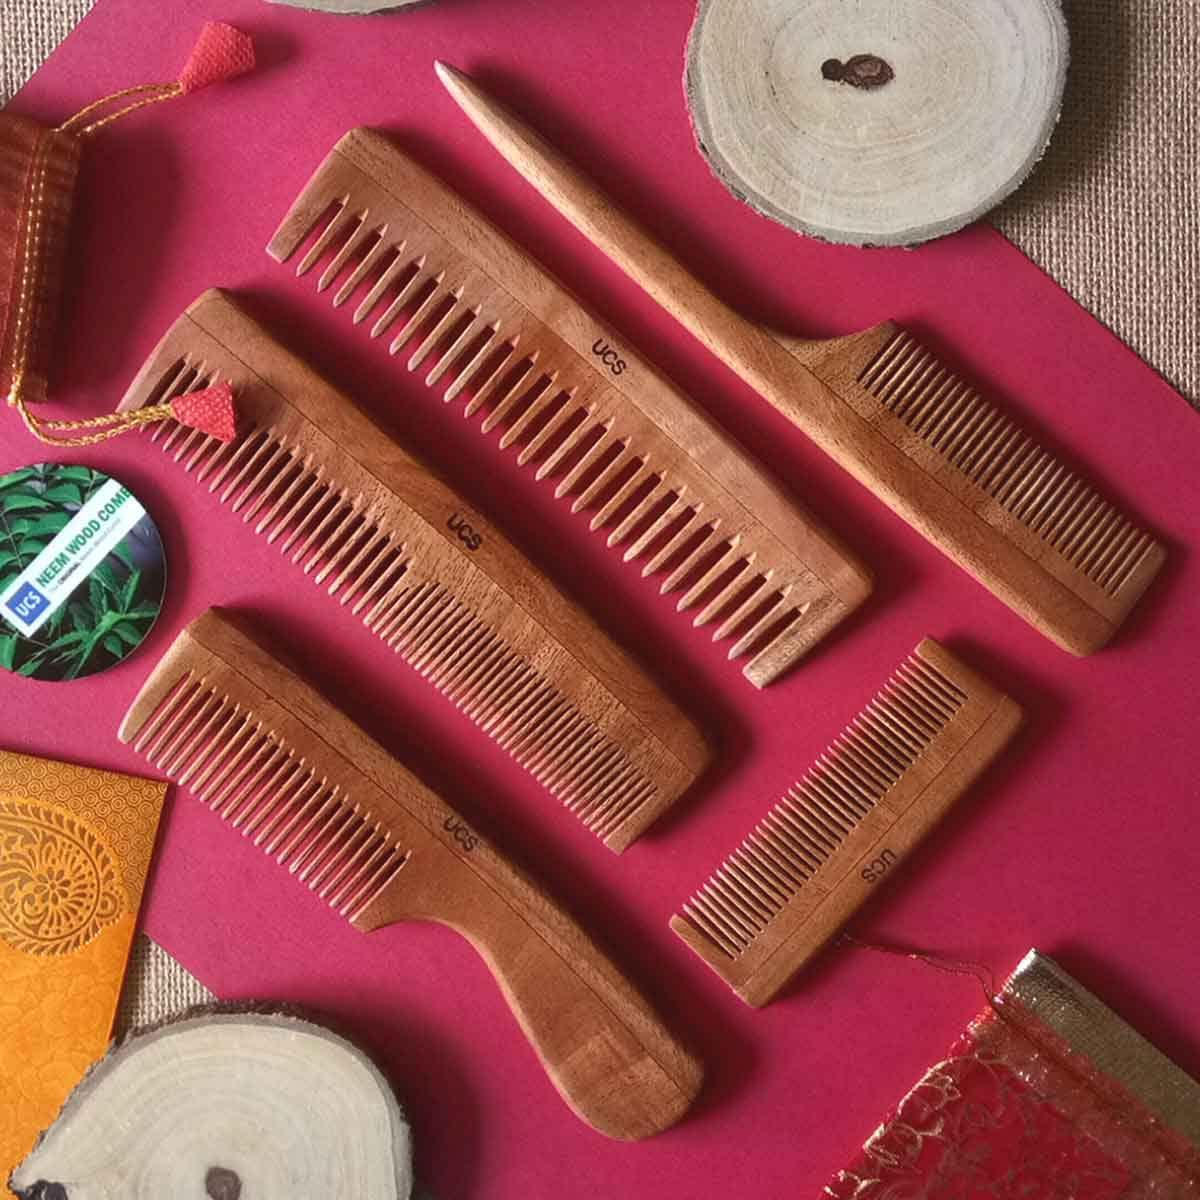 Ucs Neem Wood Comb The Original Neem Wood Combs Neem Wood Comb